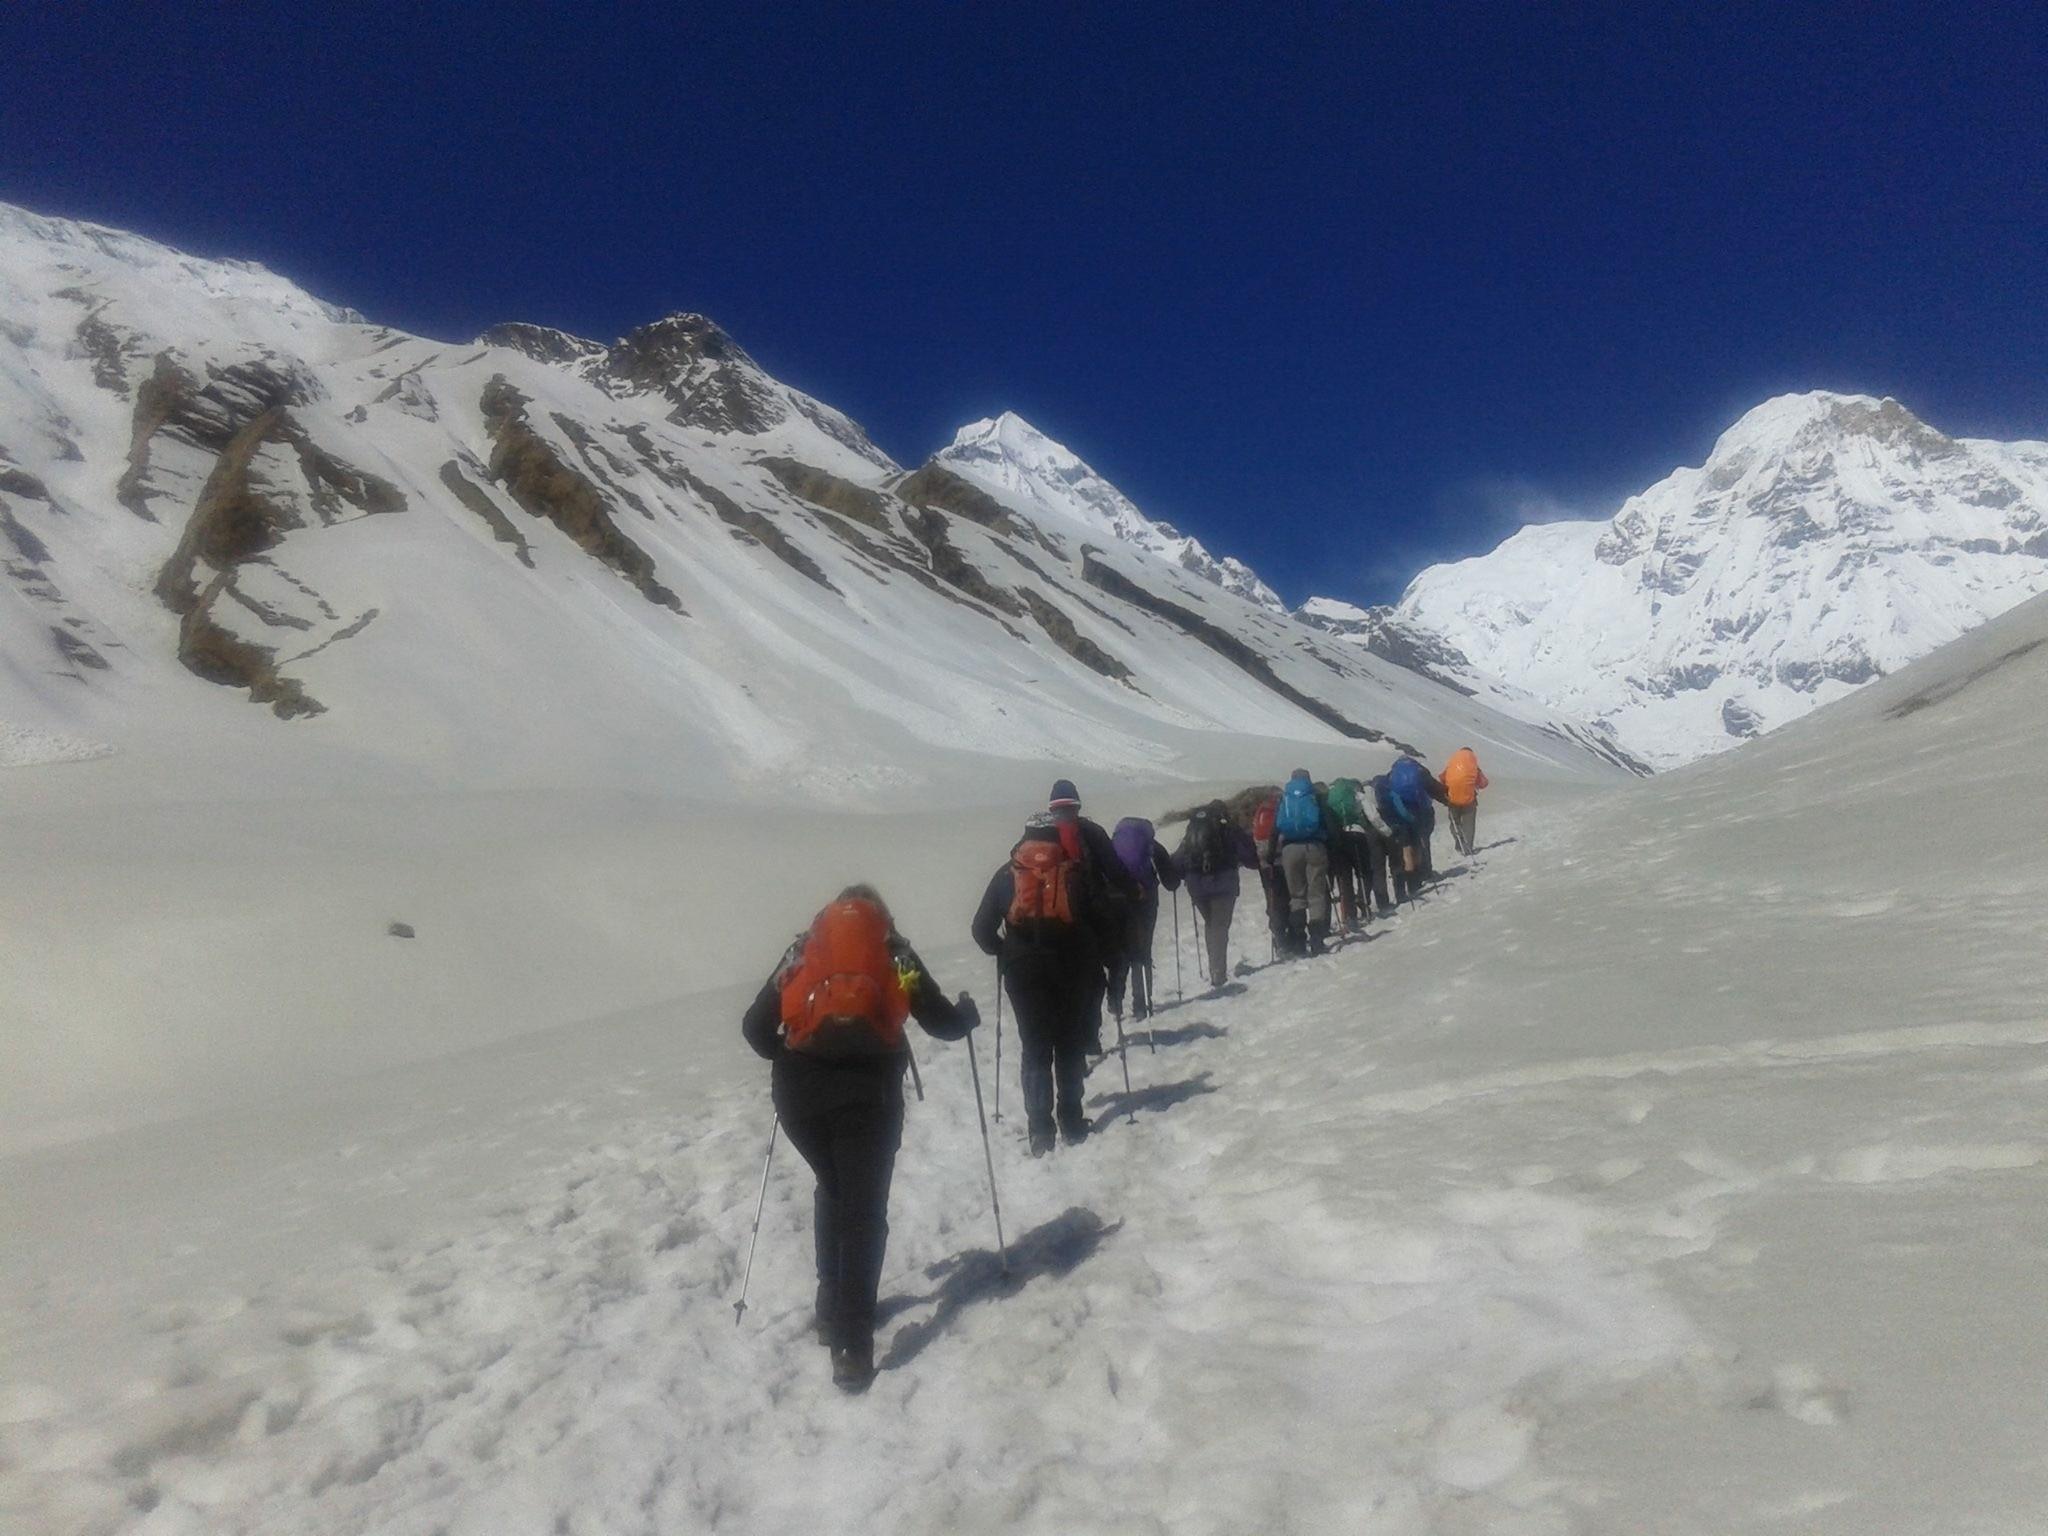 Trekking in Annapurna Base Camp